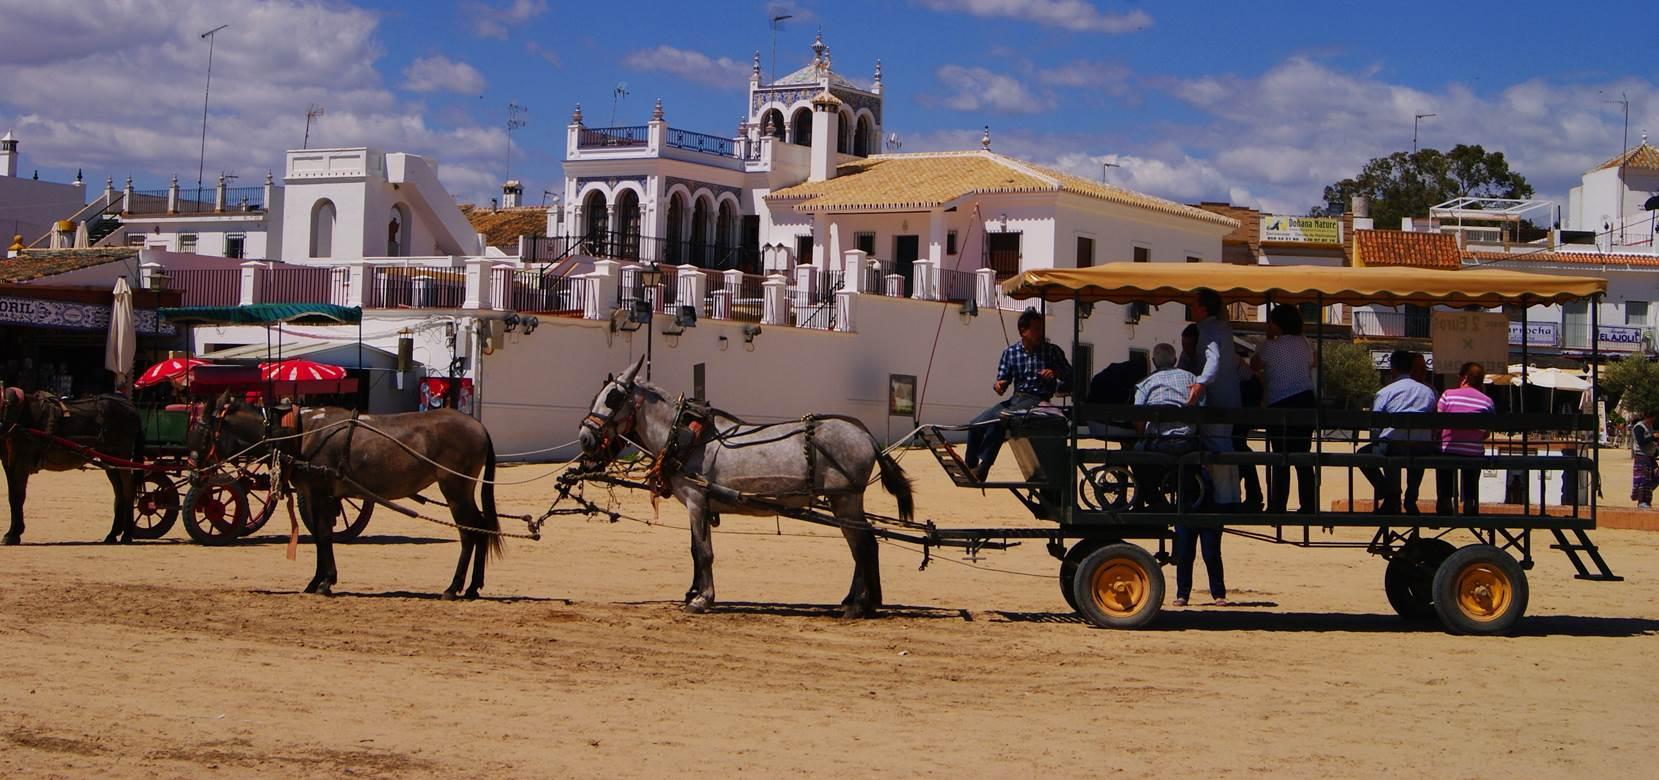 Doñana, asperillo, laguna Jaral, parque natural, parque nacional, parque dunar, dunas, dunas fijas, huelva, andalucia, acantilado, senderismo, rutas, el Rocío